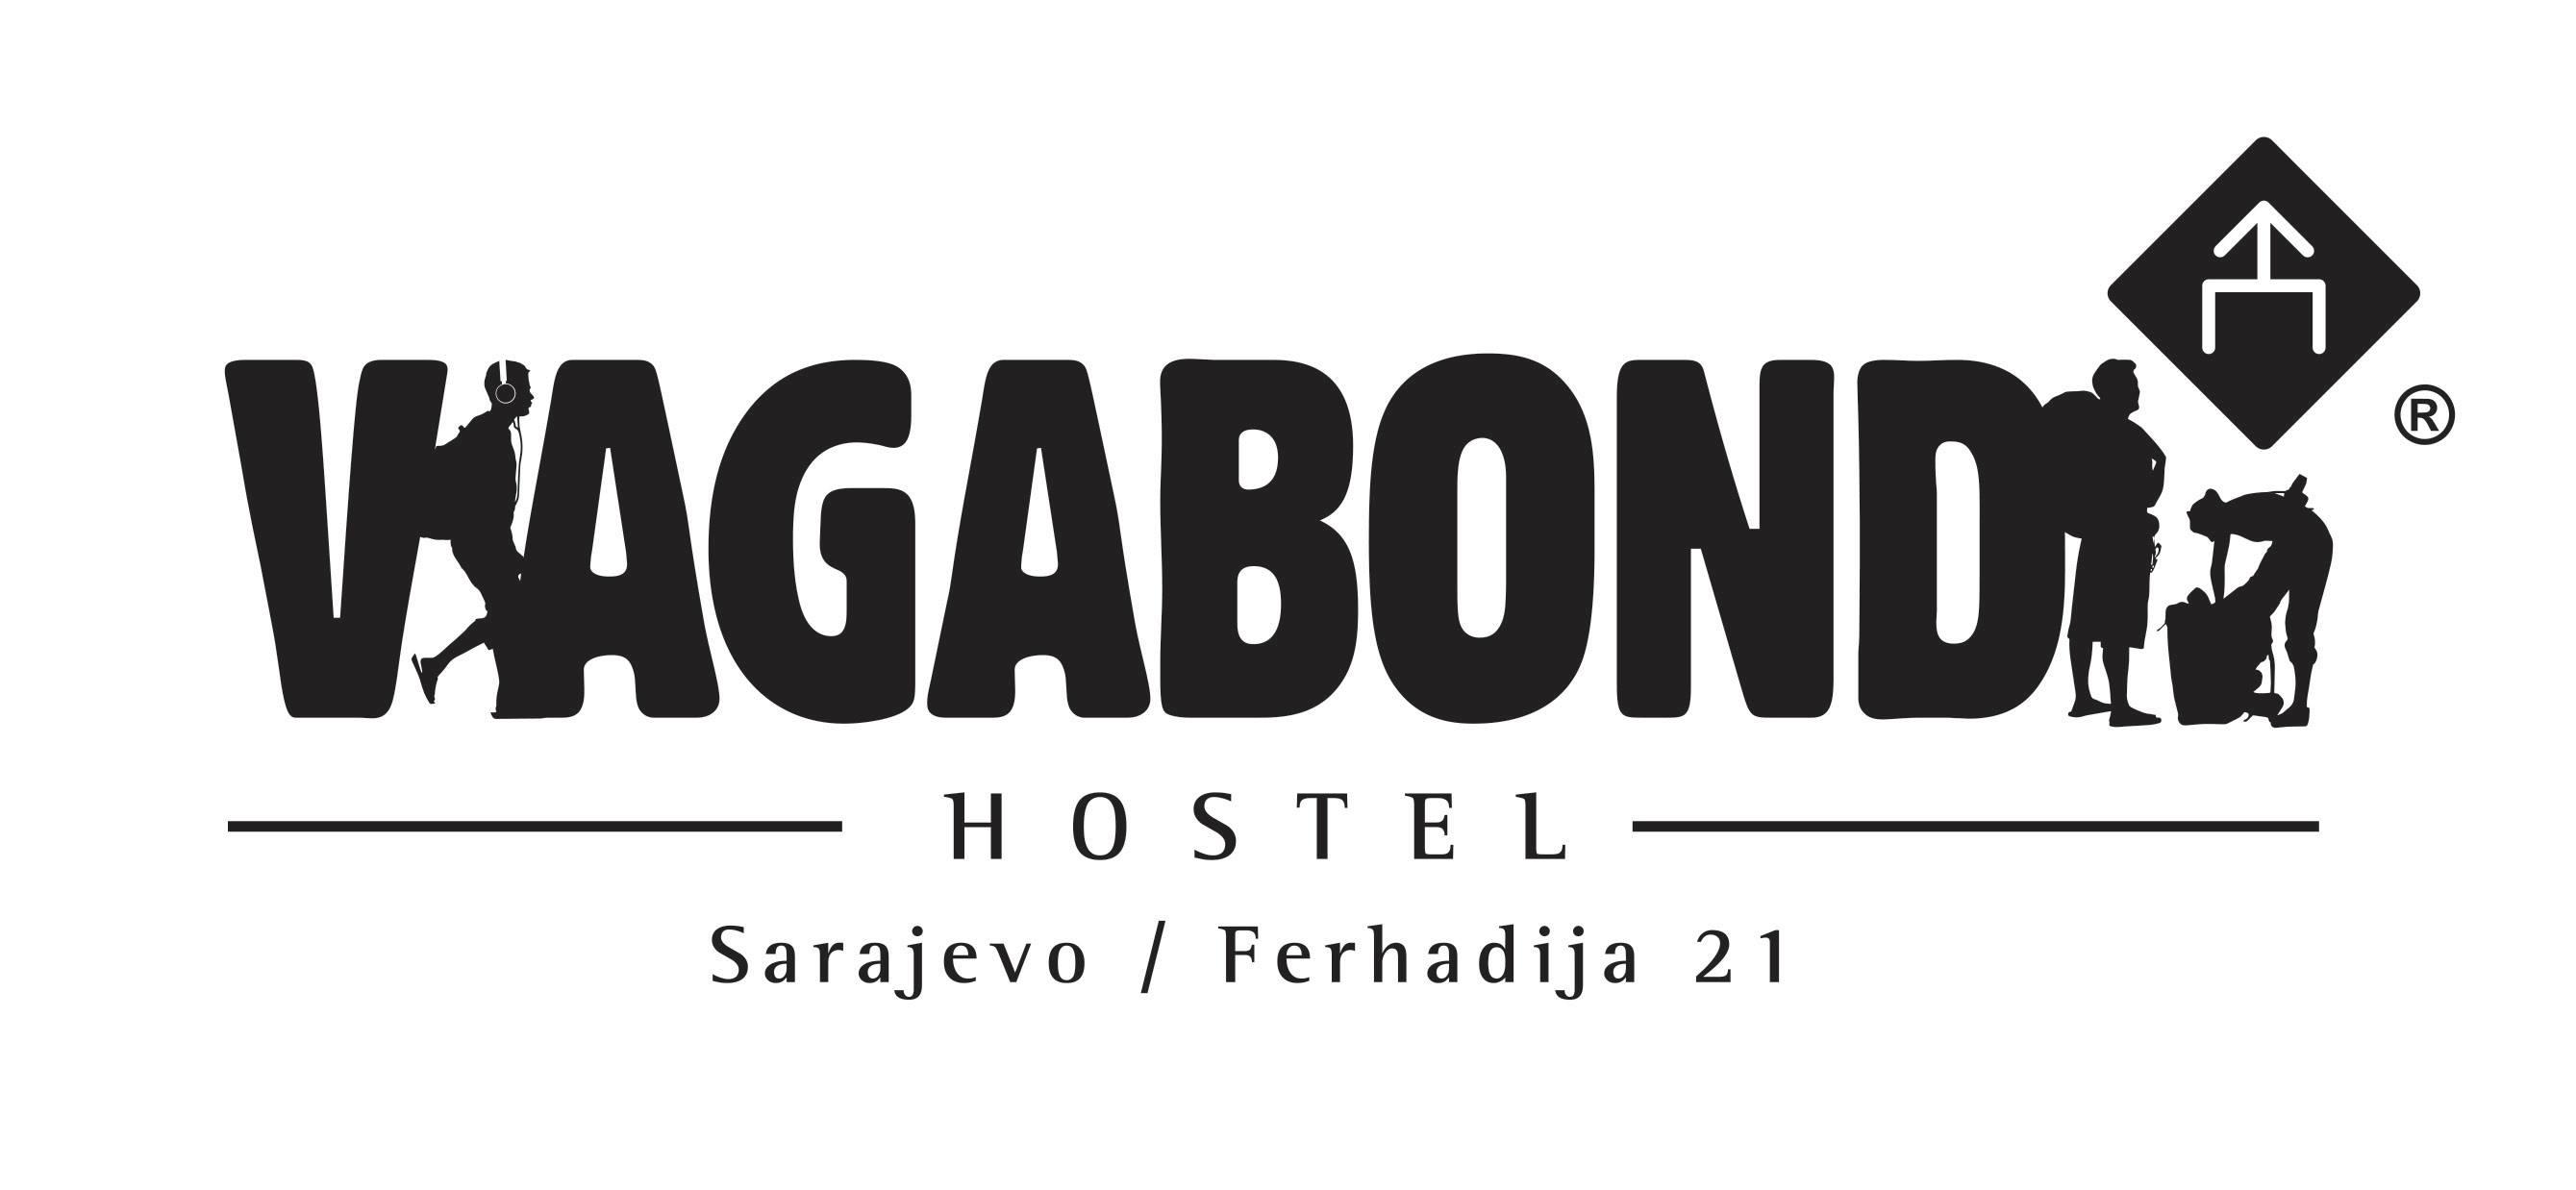 Hostel Vagabond